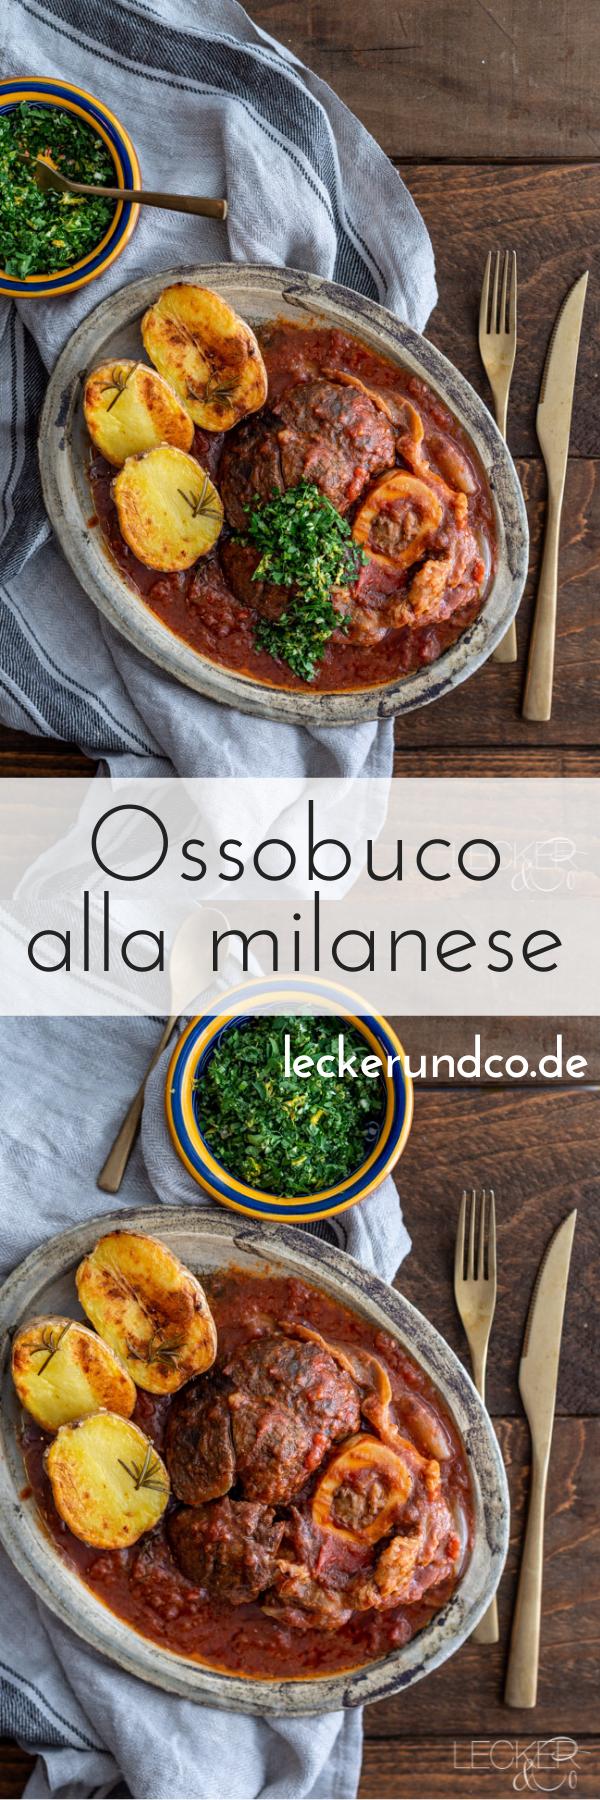 Ossobuco alla Milanese mit Gremolata und Rosmarin-Kartoffeln